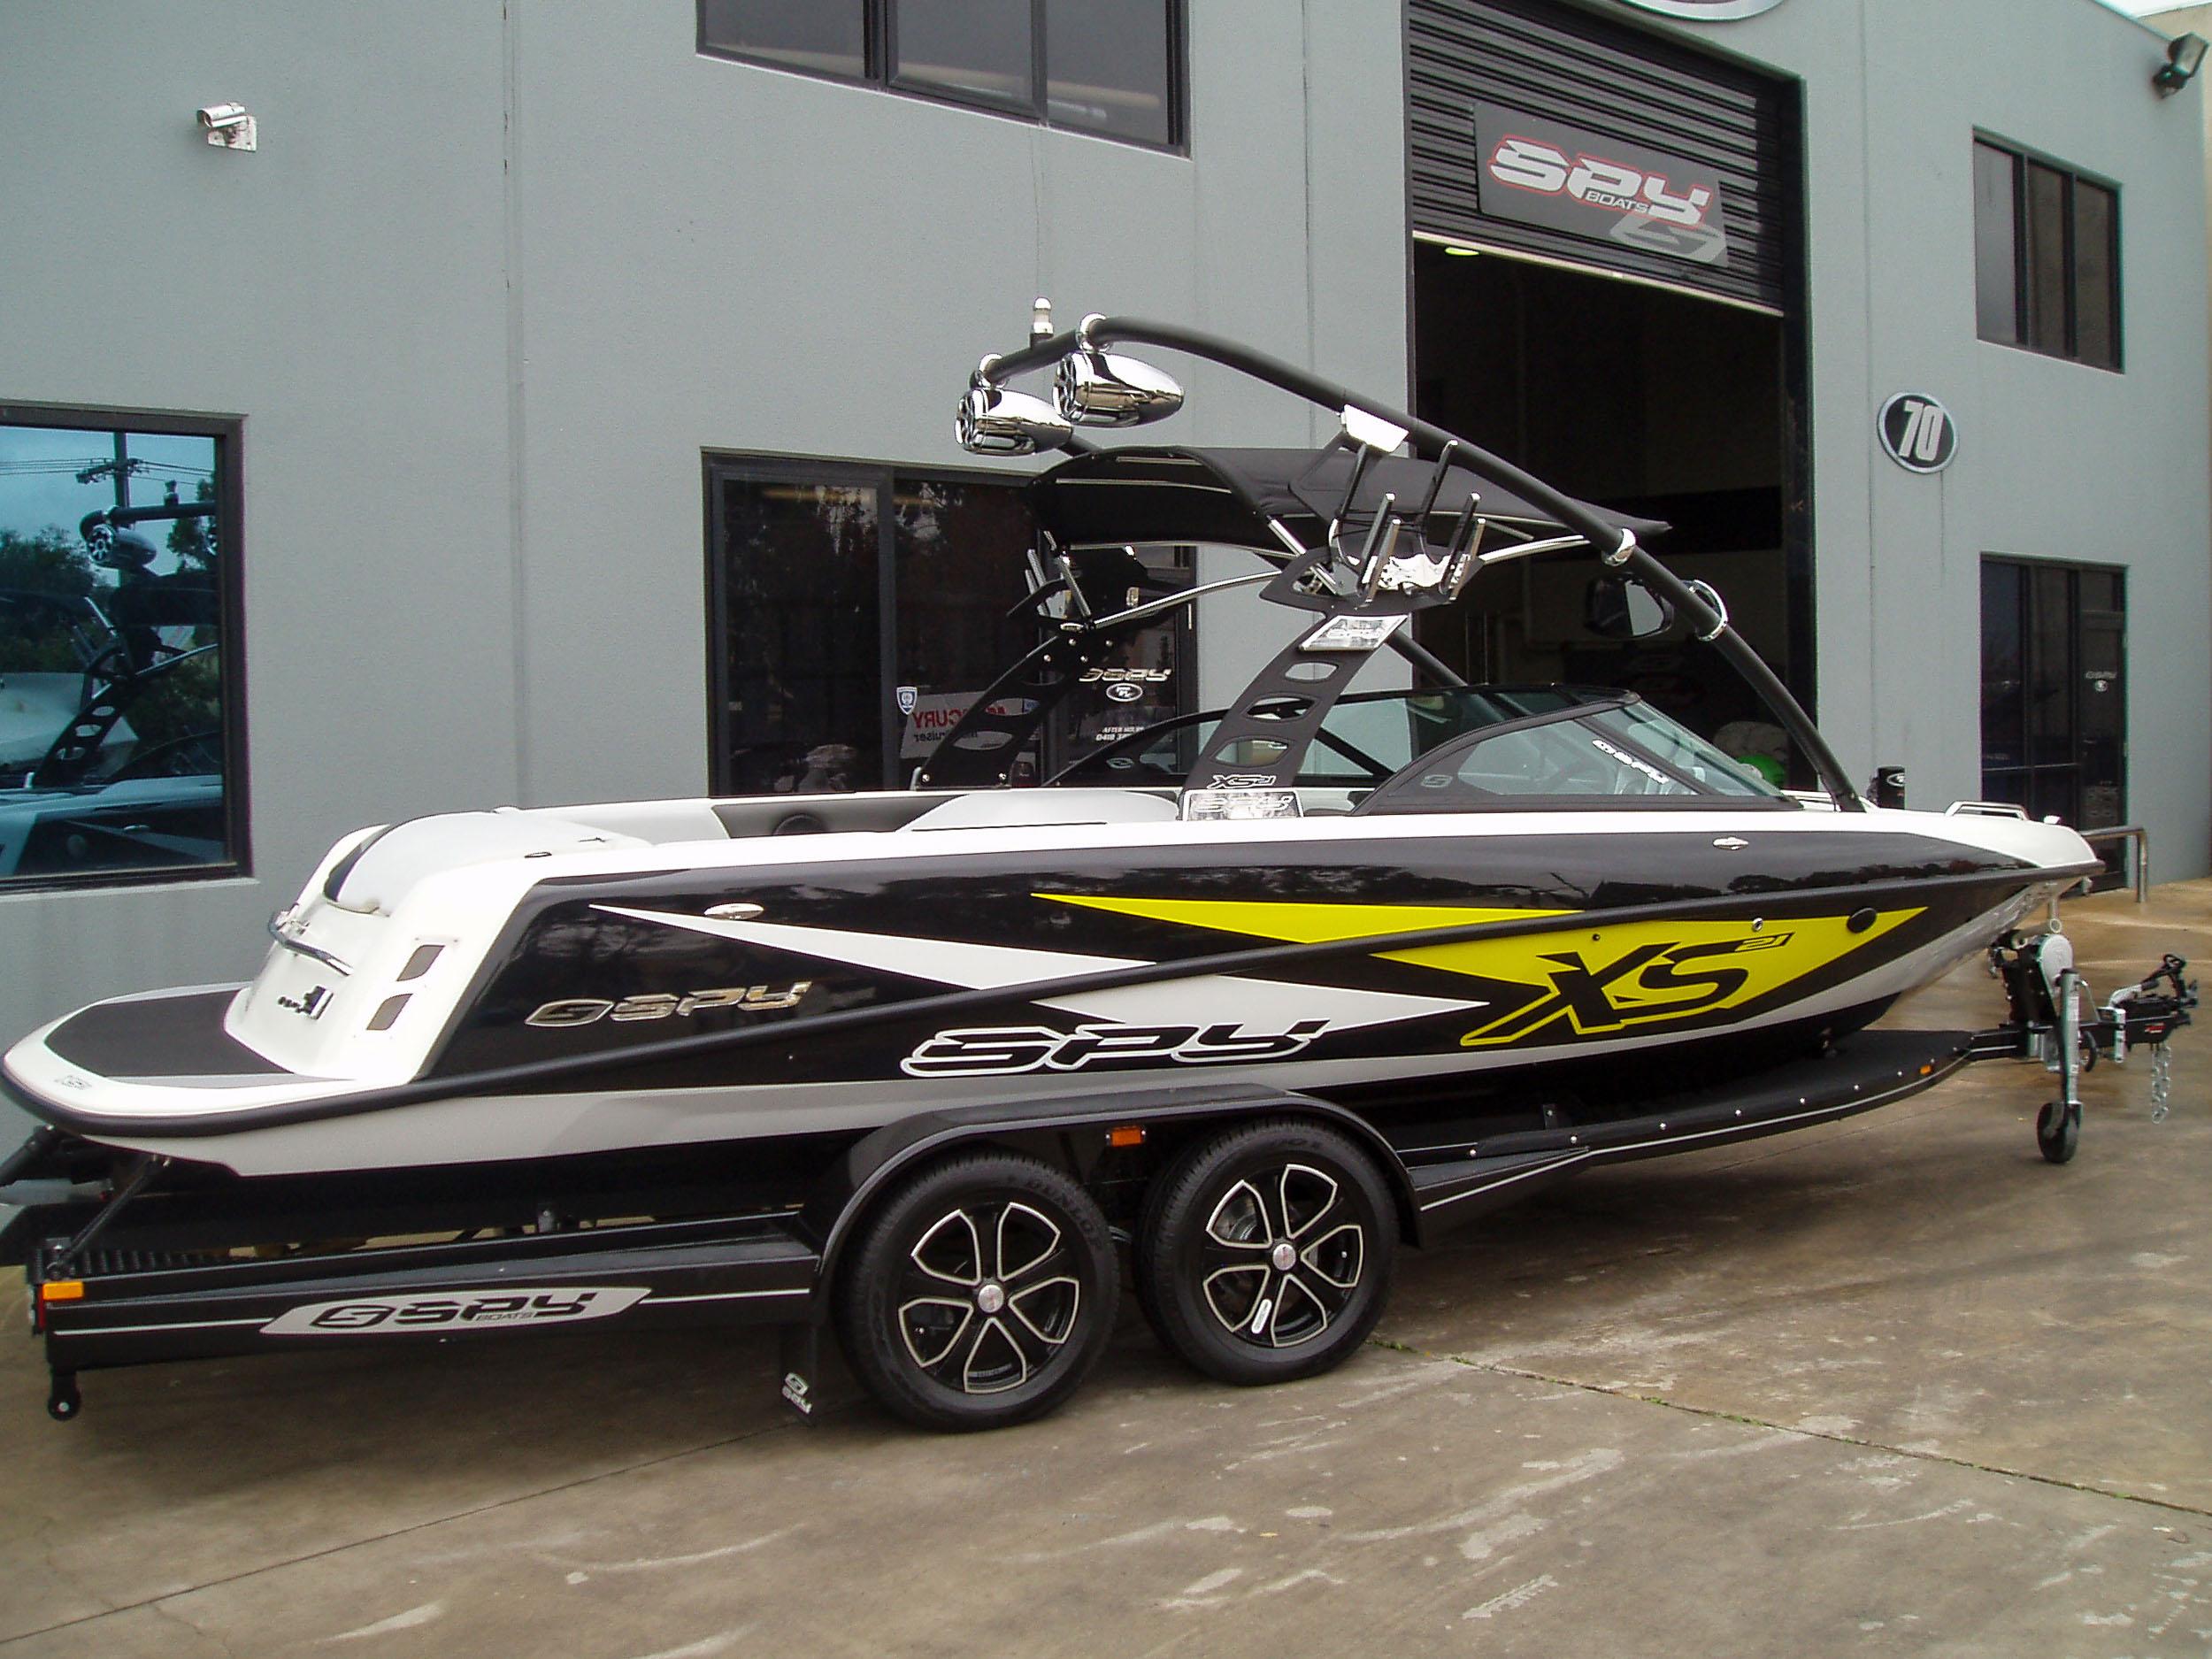 Spy_Boats_XS21-1.jpg